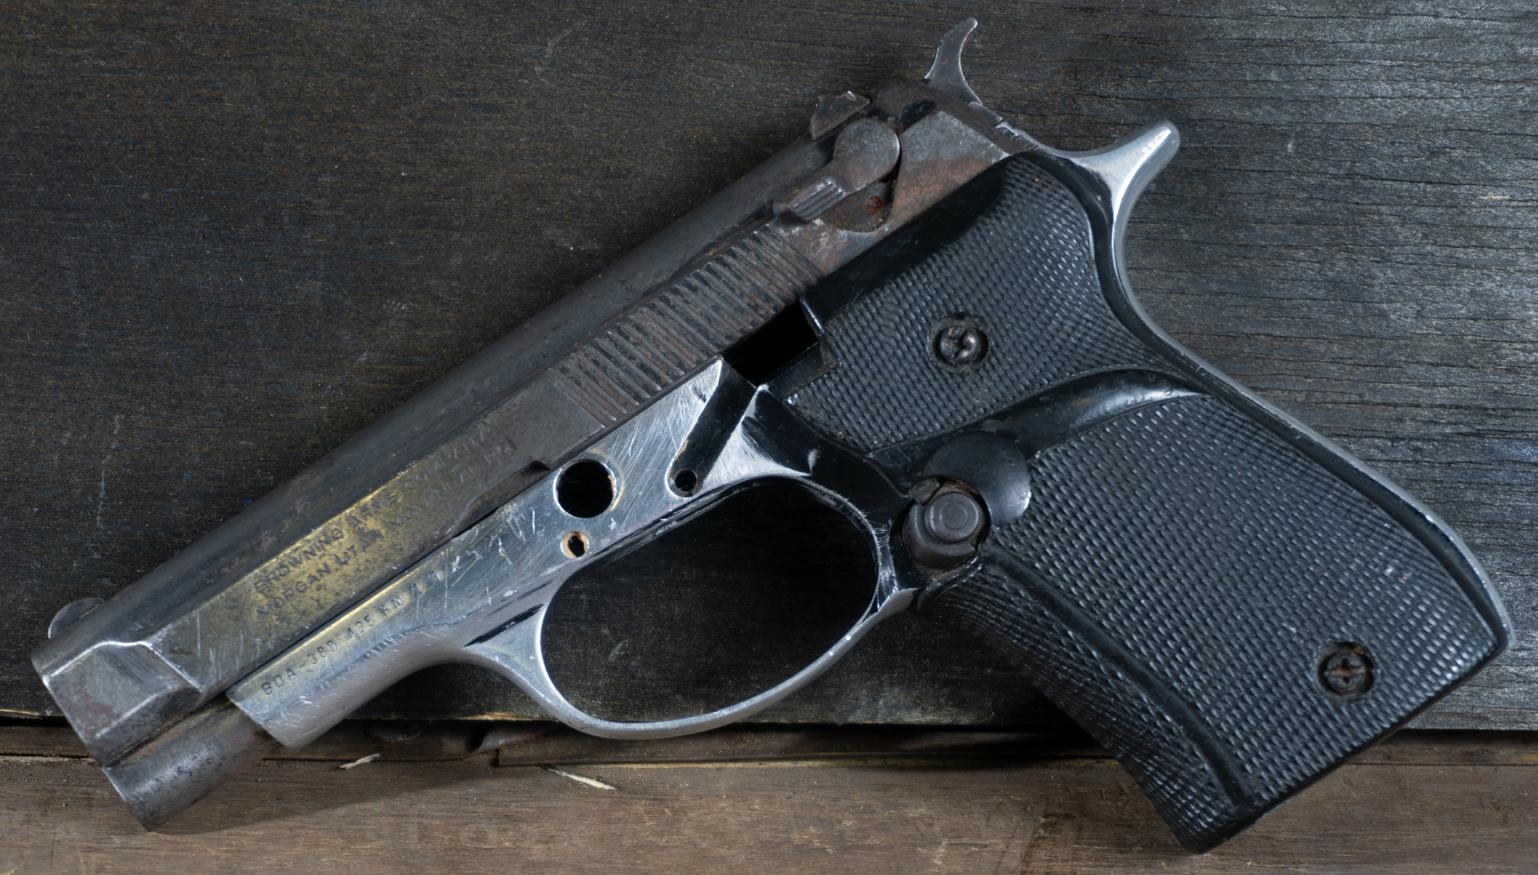 Browning BDA-380, 380 ACP, No Magazine, *Poor, Incomplete*